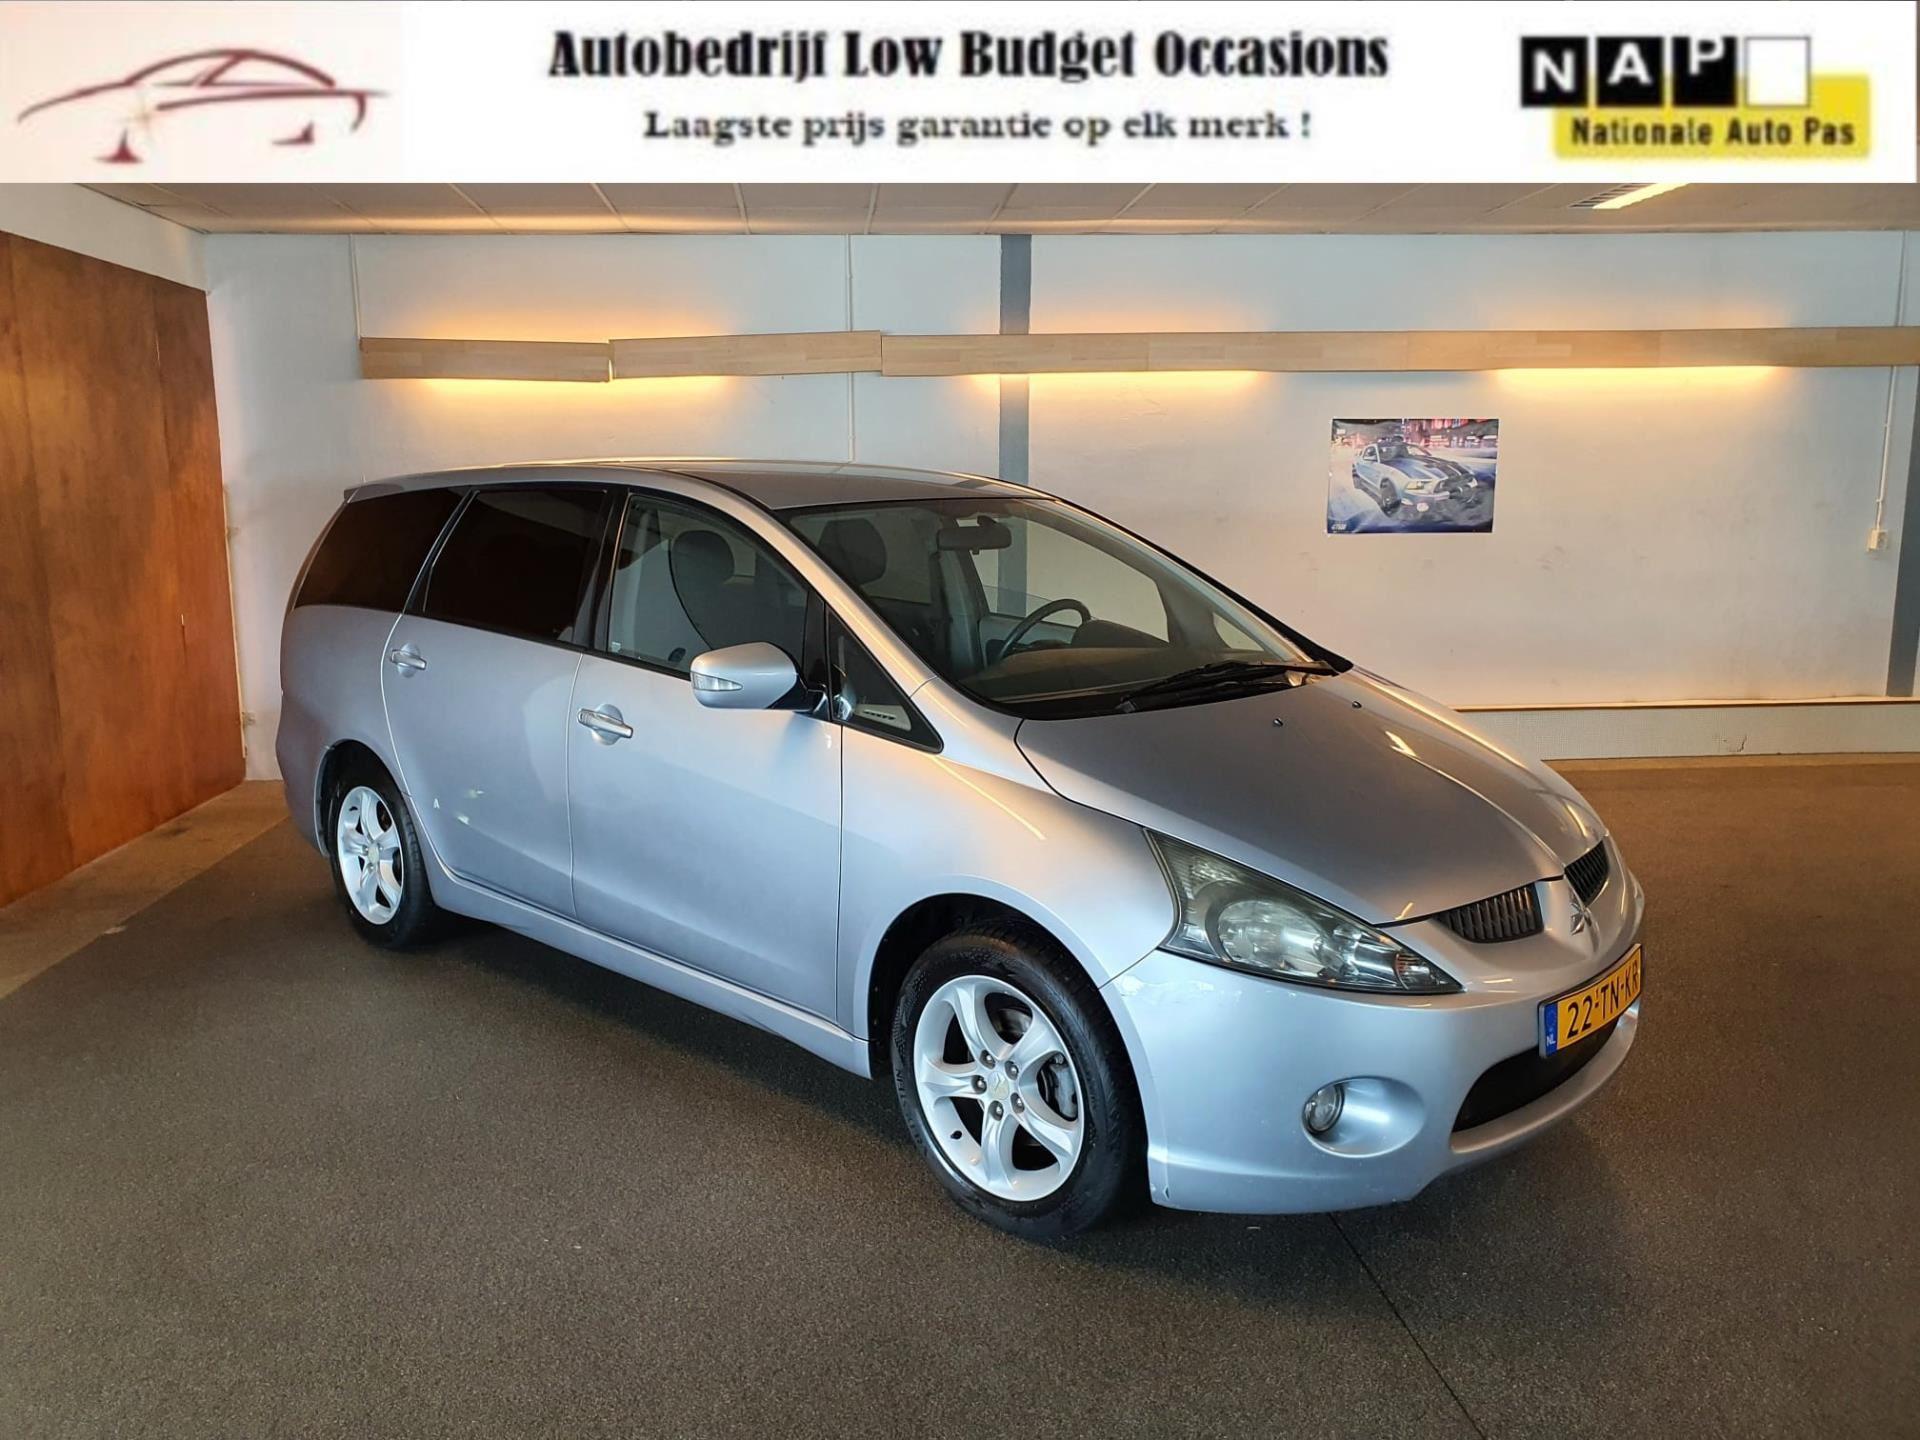 Mitsubishi Grandis occasion - Low Budget Occasions